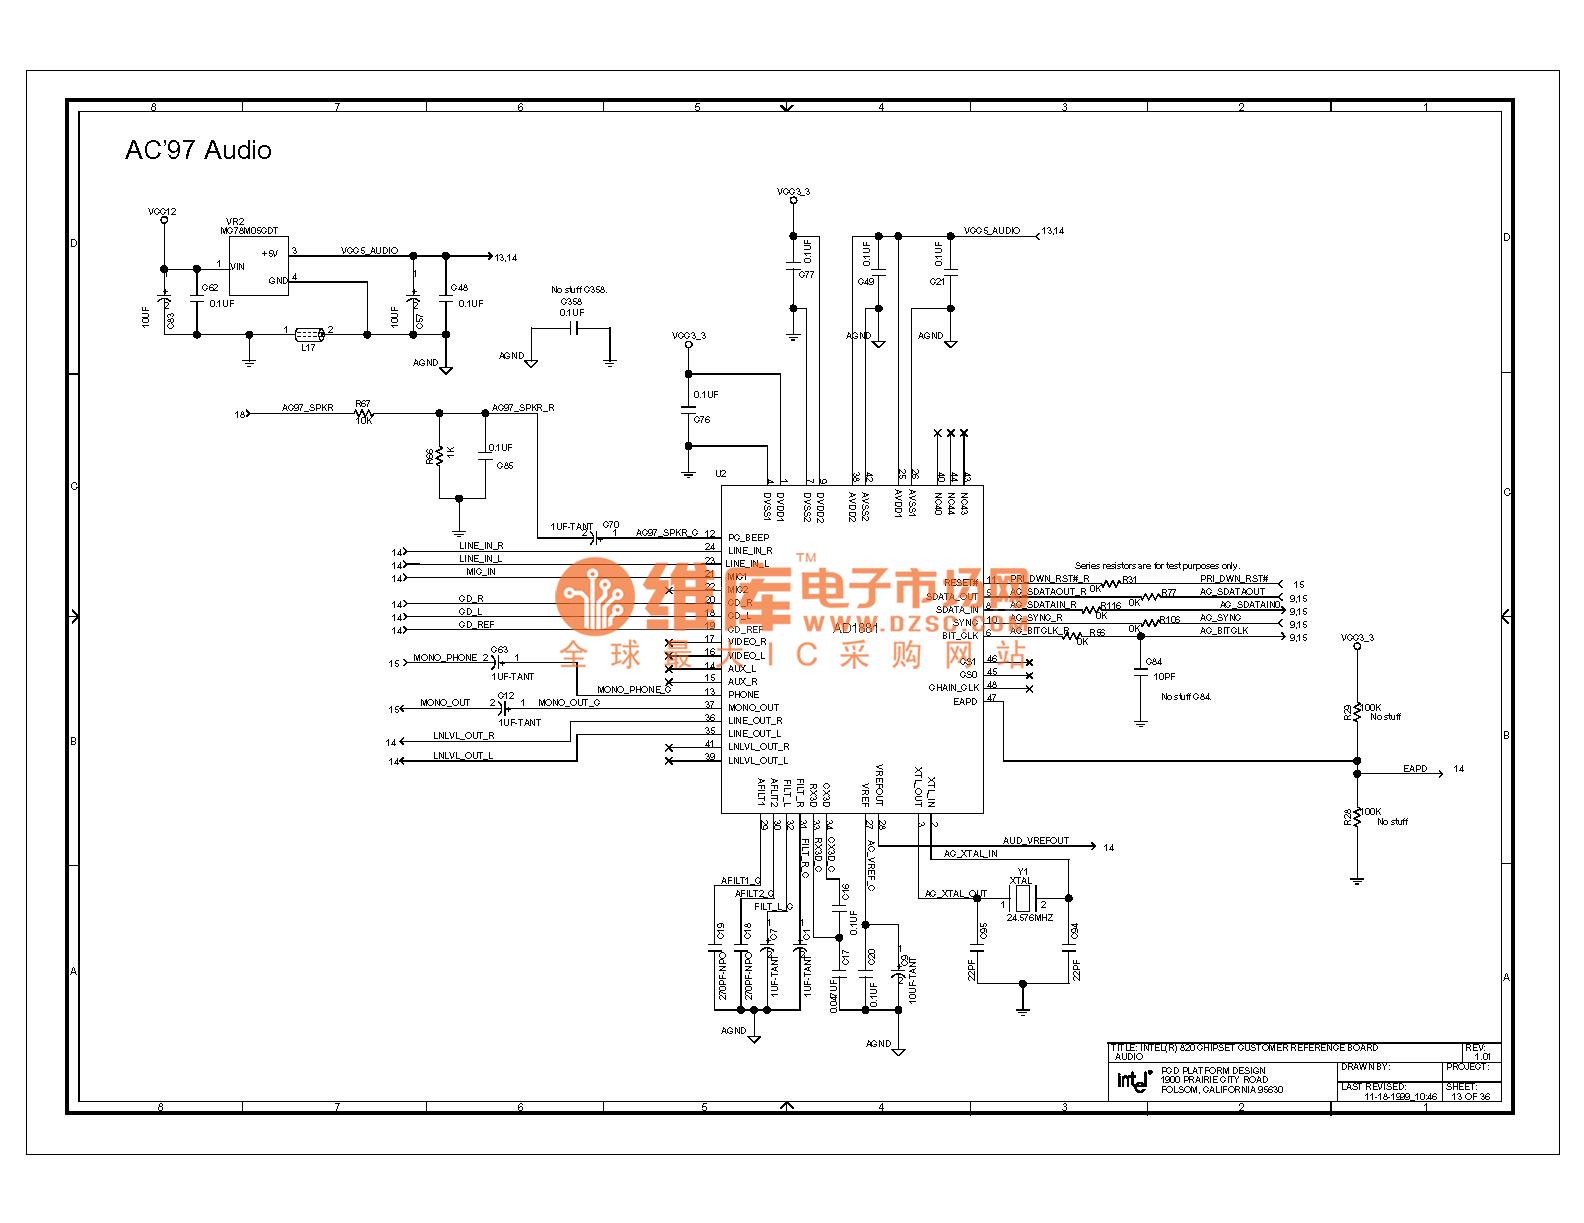 820e computer motherboard circuit diagram 13 - computer-related circuit